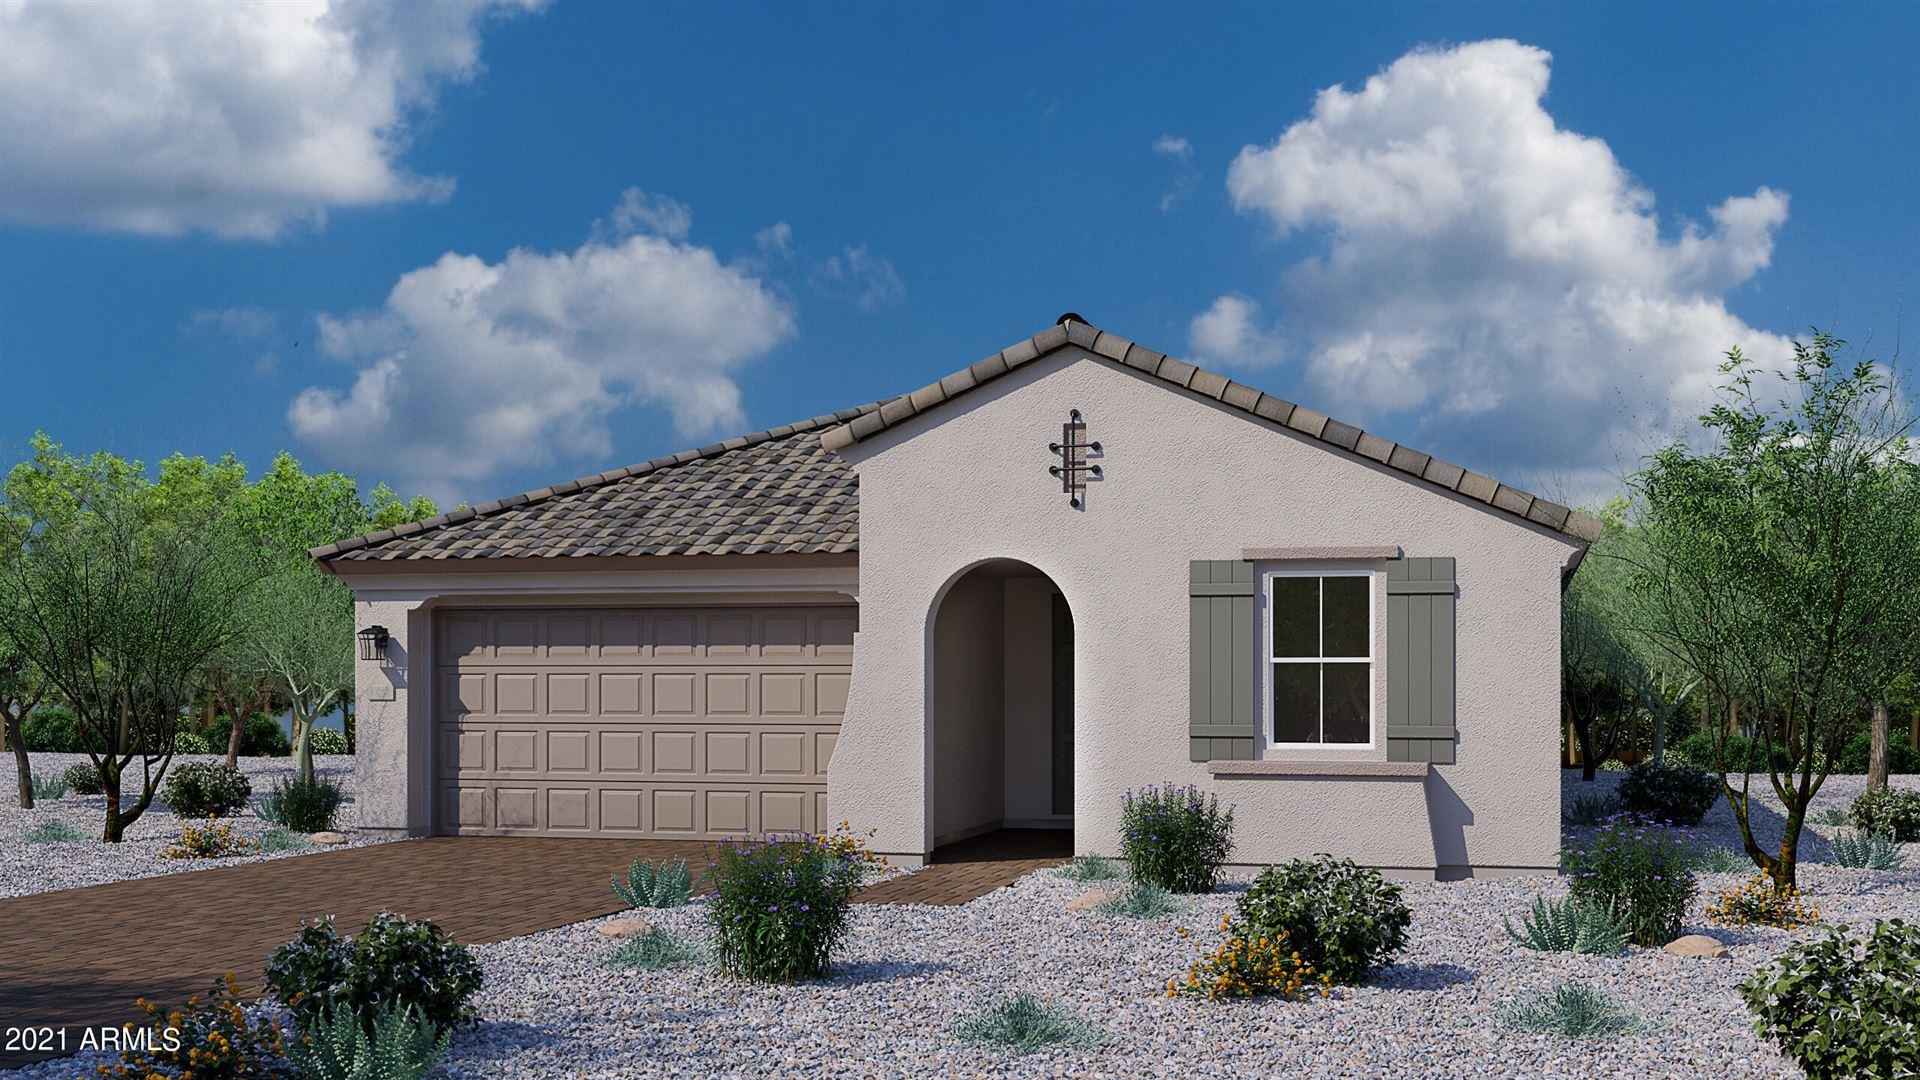 9764 E SEISMIC Avenue, Mesa, AZ 85212 - MLS#: 6273056